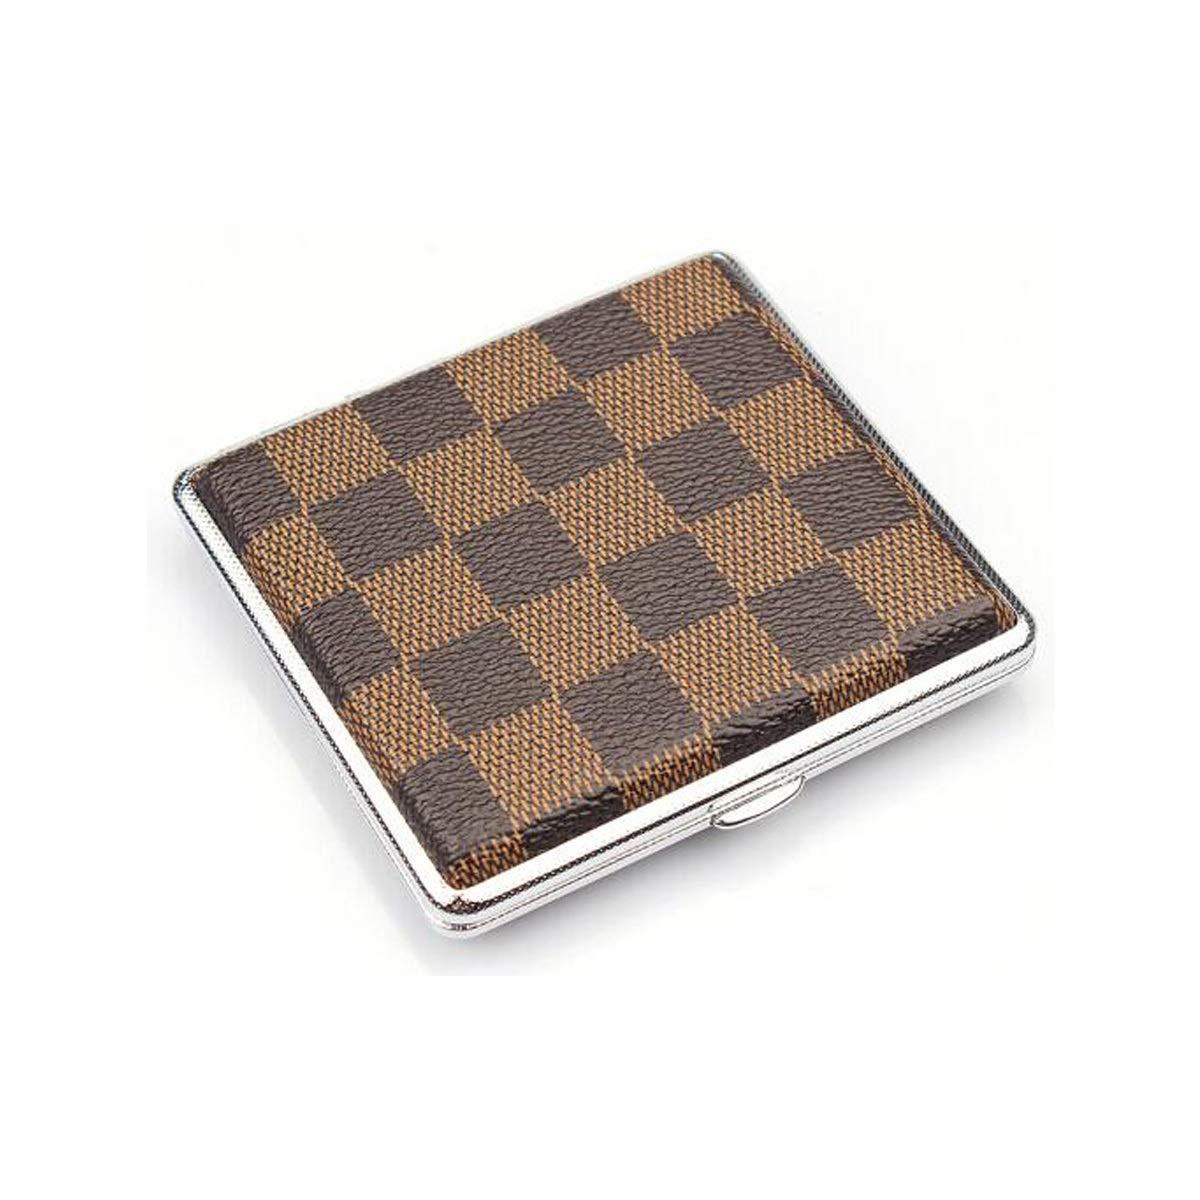 WENPINHUI Cigarette Case, 20 Packs Creative Metal Cigarette Case Personality Plaid Cigarette Case Automatically Pops The Cigarette Box (Color : Brown) by WENPINHUI